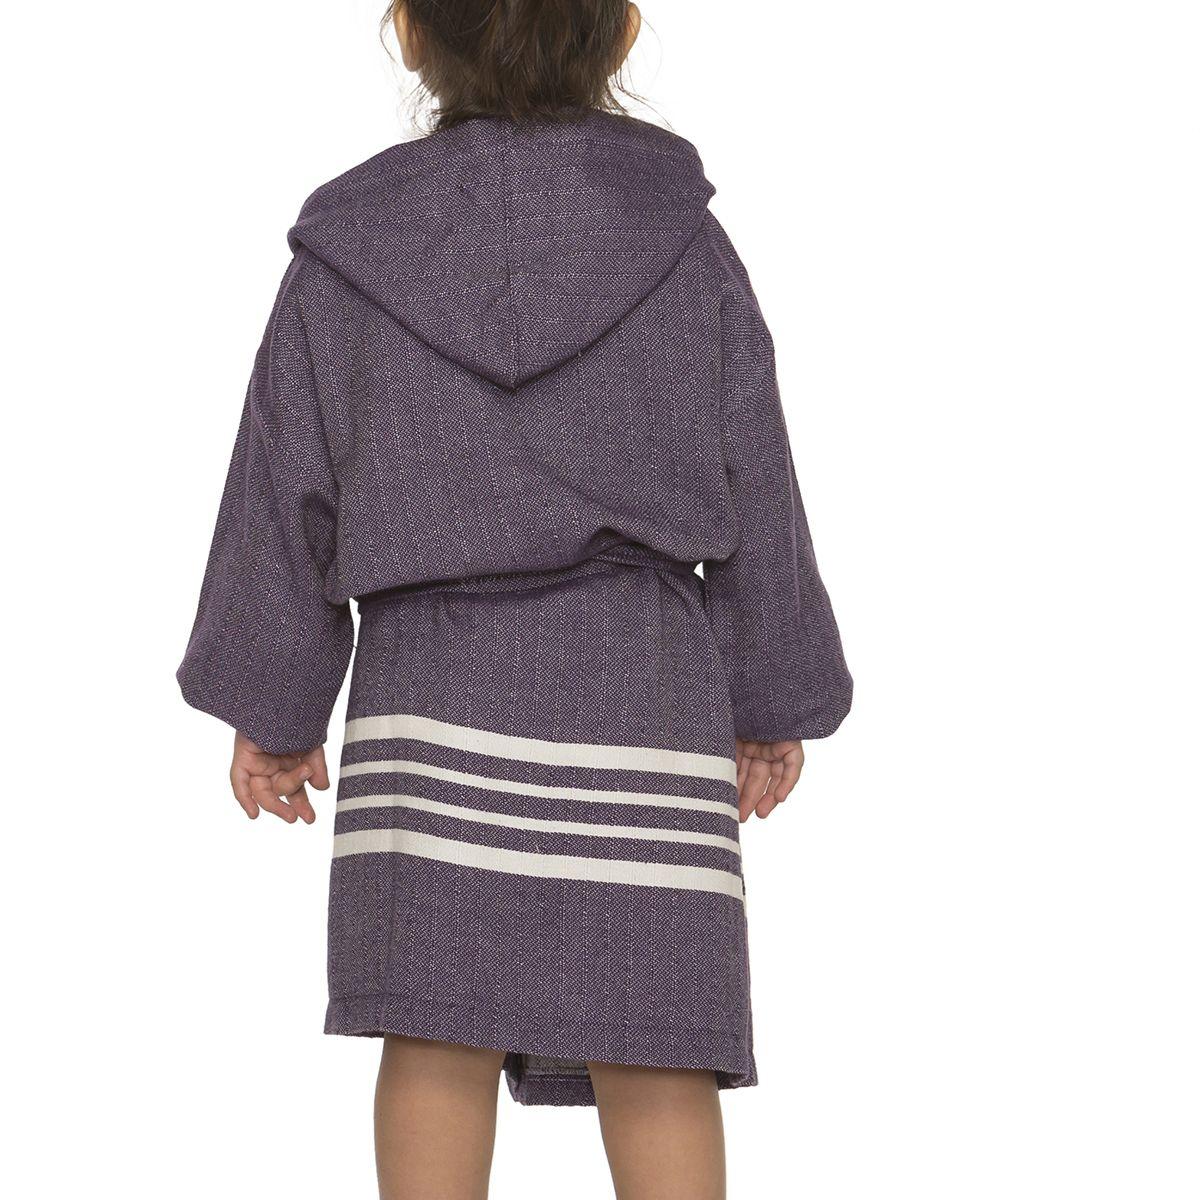 Bathrobe Kiddo with hood - Dark Purple